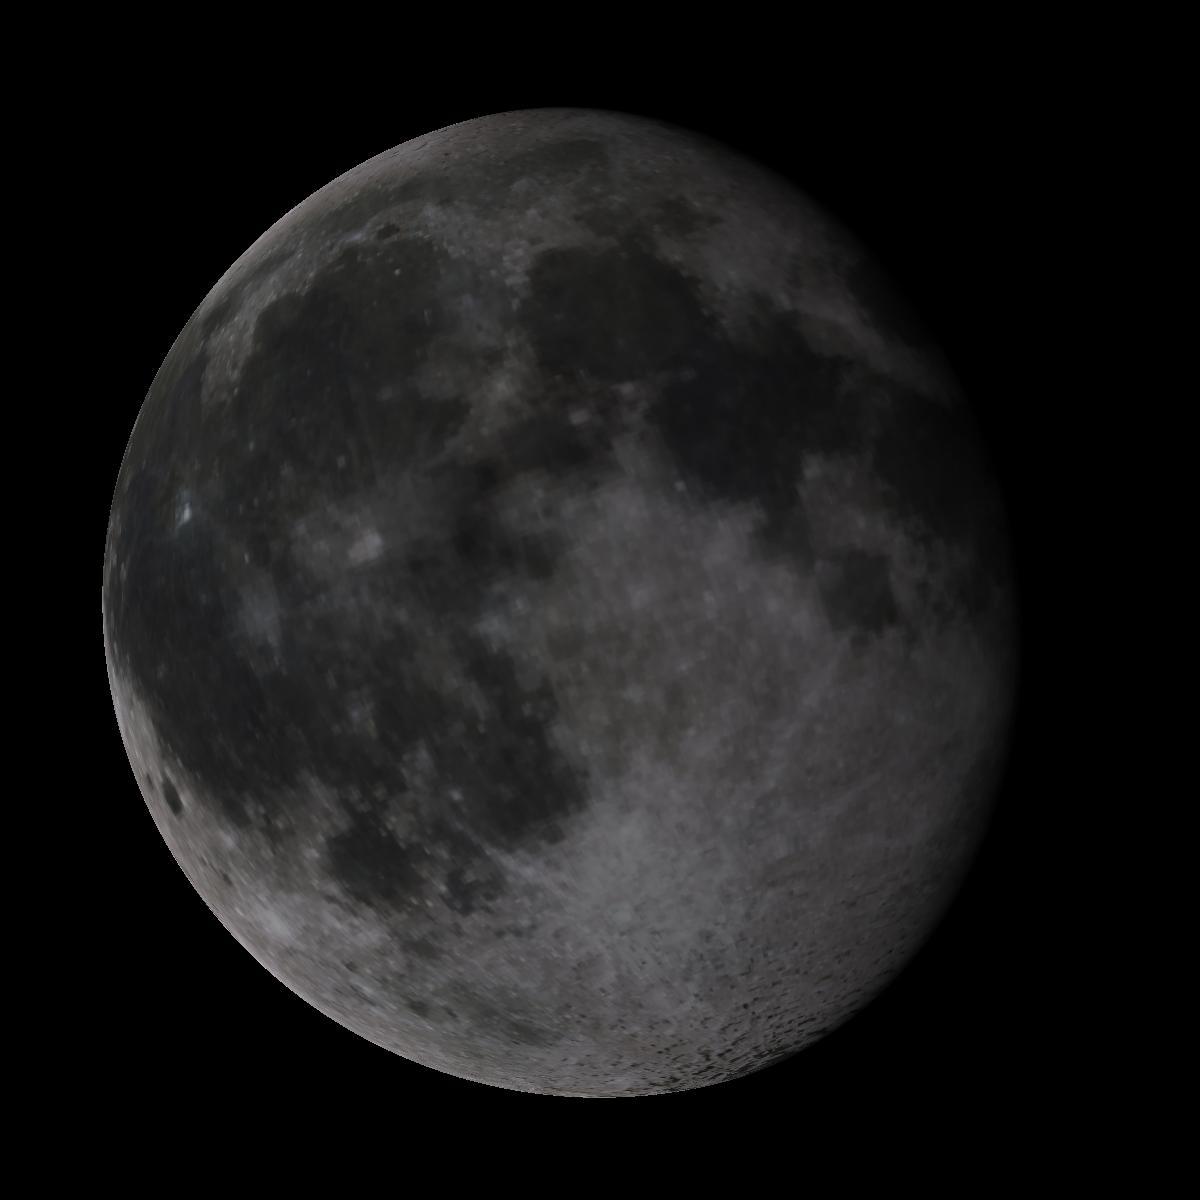 Lune du 12 mars 2020